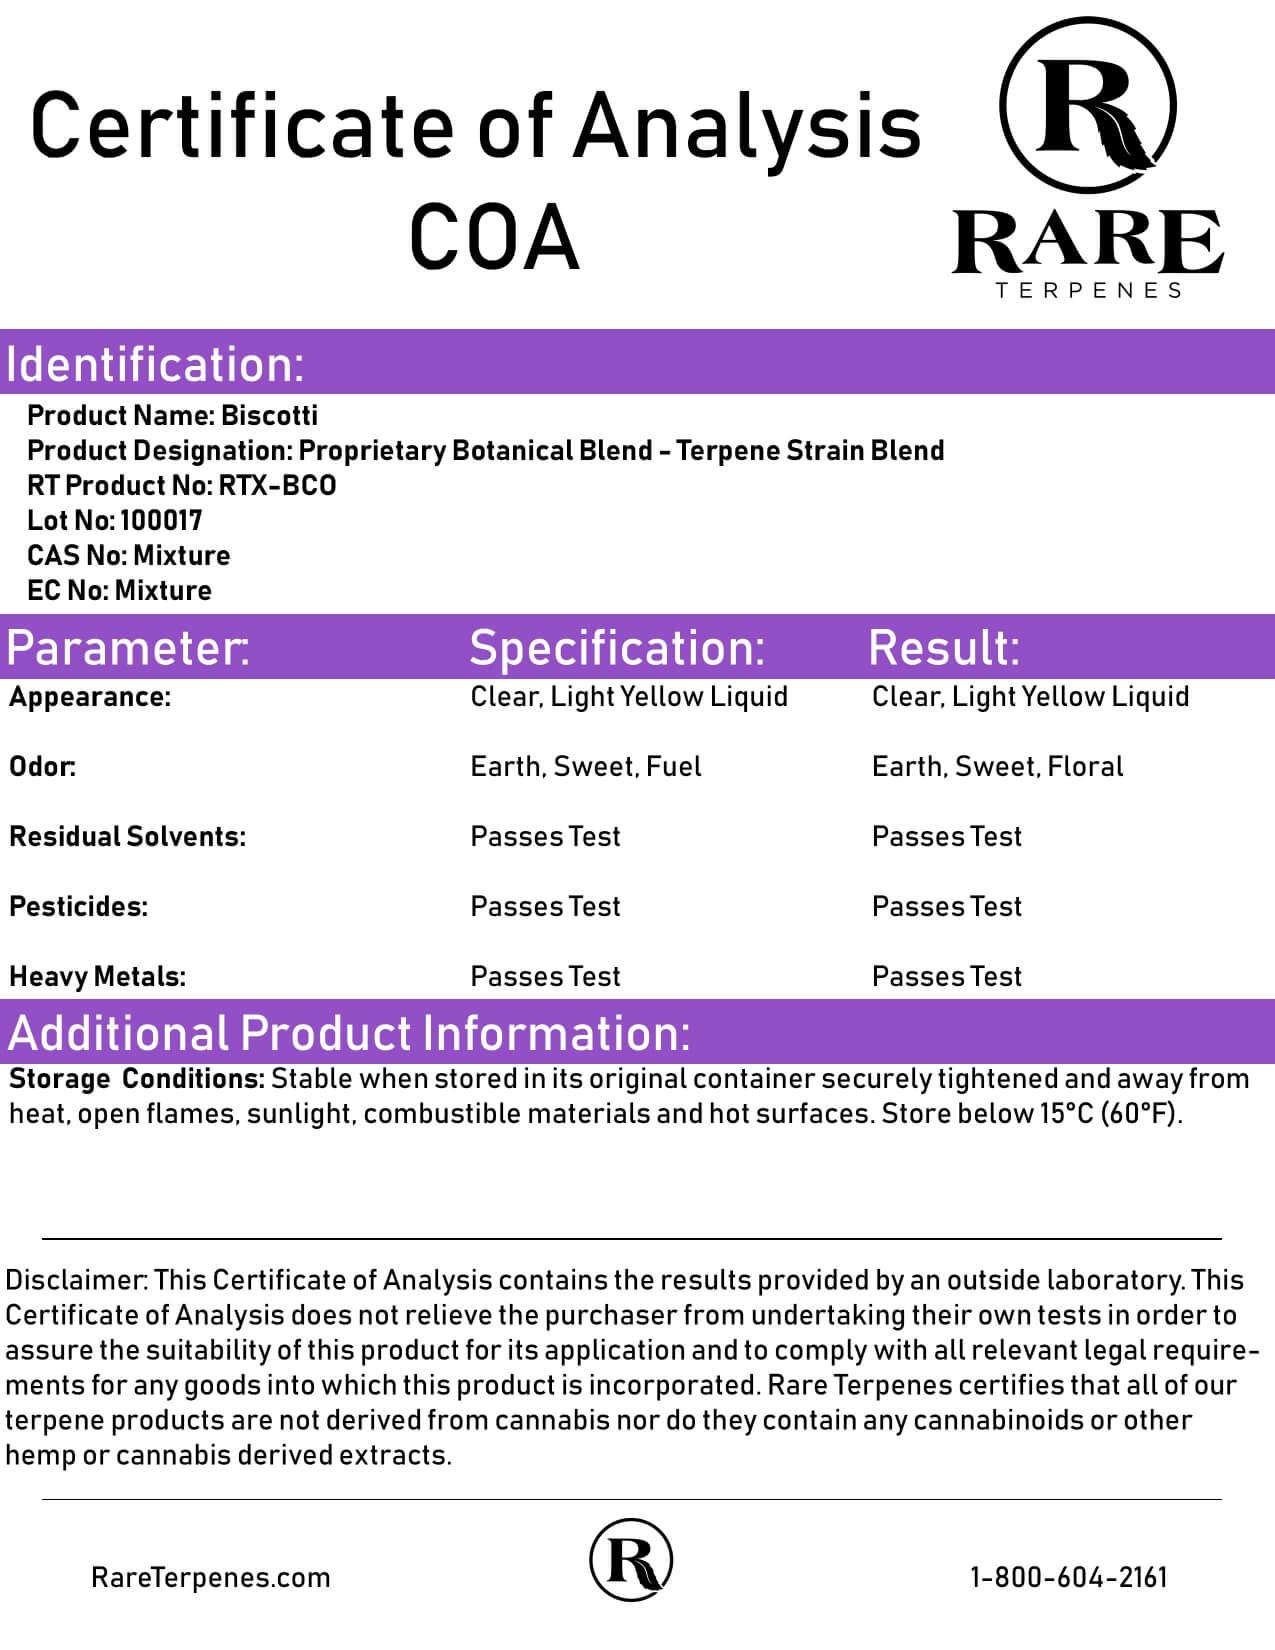 Rare Terpenes Tepene Strain Blends Biscotti Lab Report